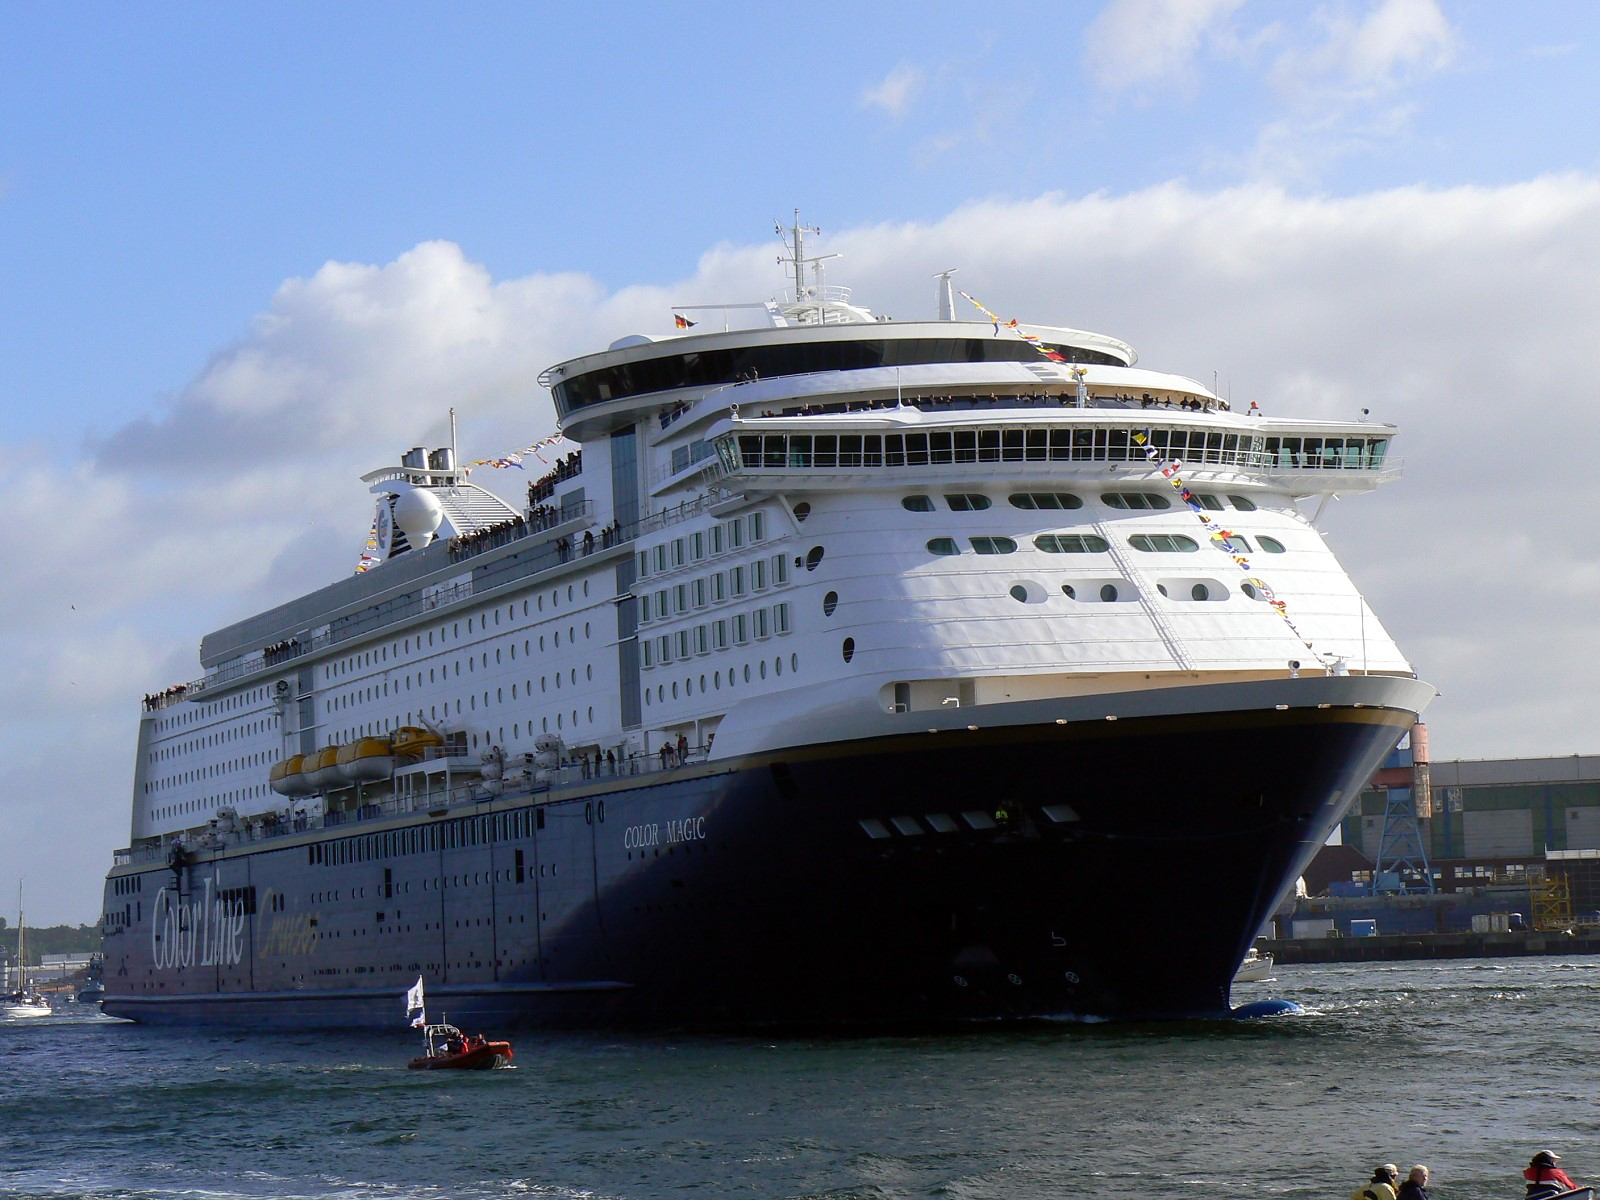 Book color line ferry - Ms Color Magic The Largest